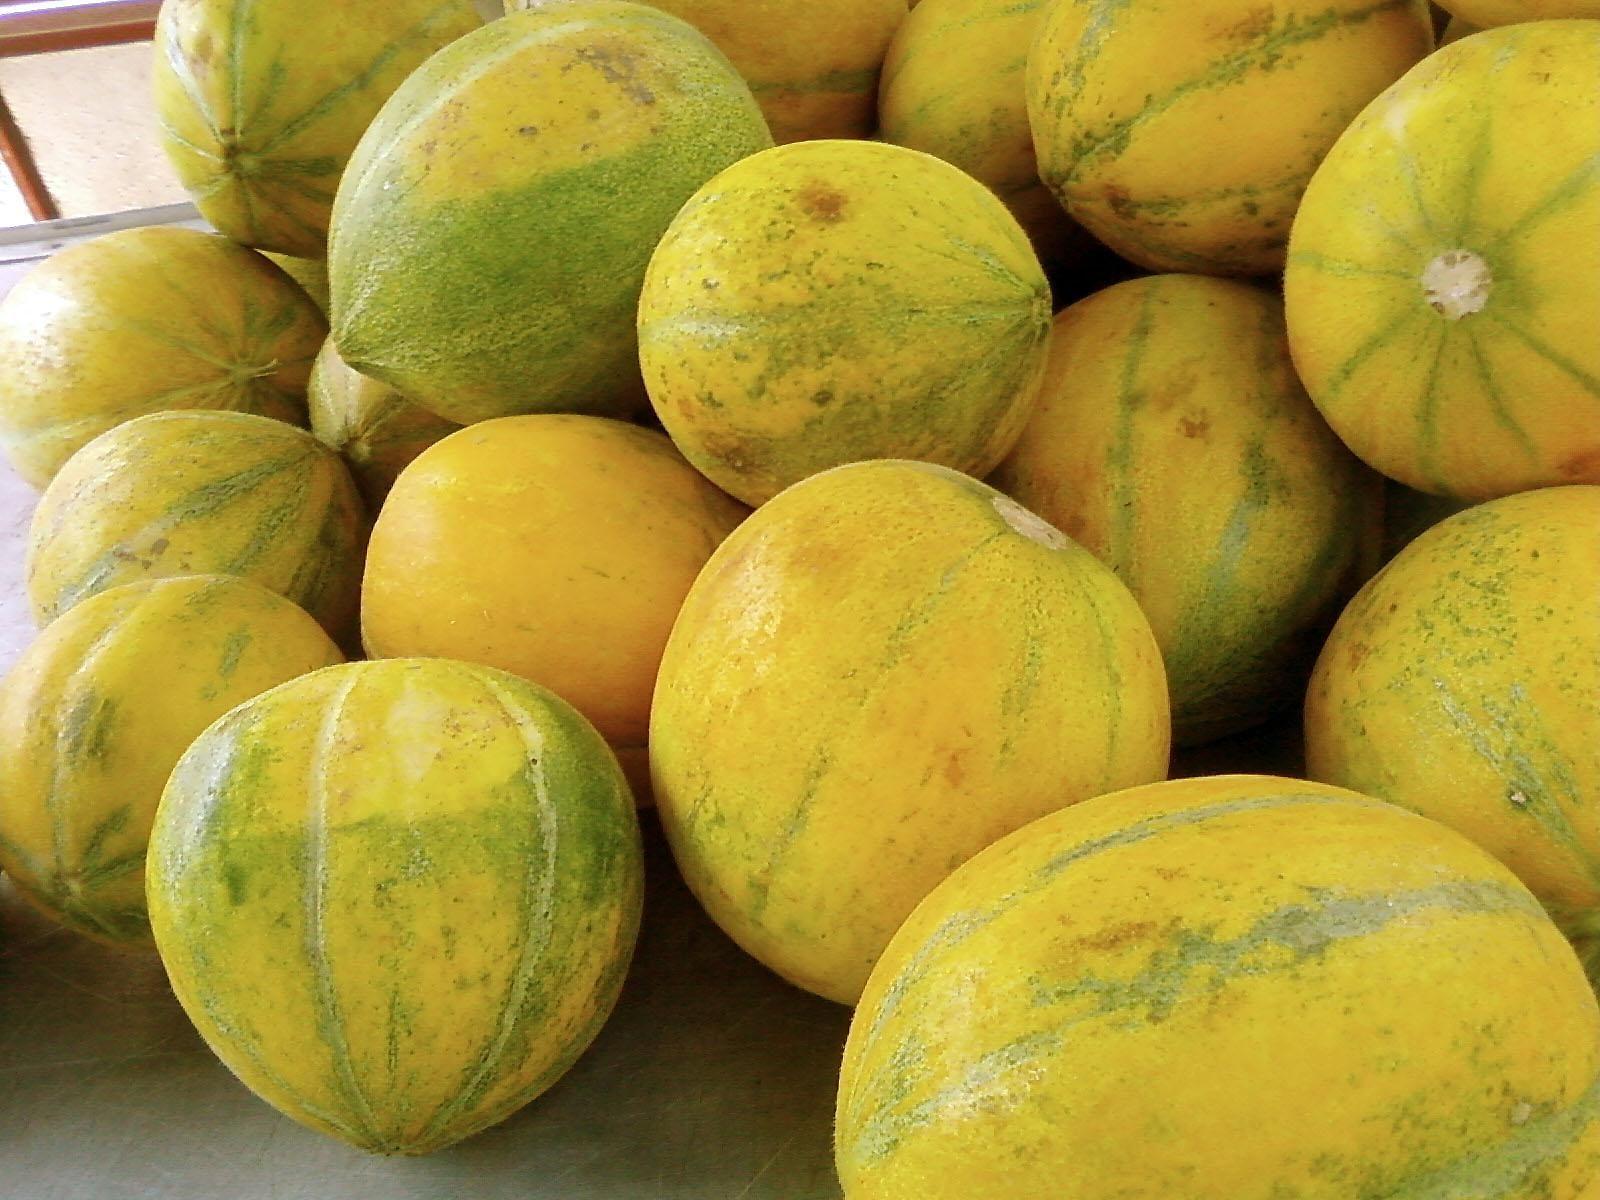 File:Yellow melon.jpg - Wikimedia Commons